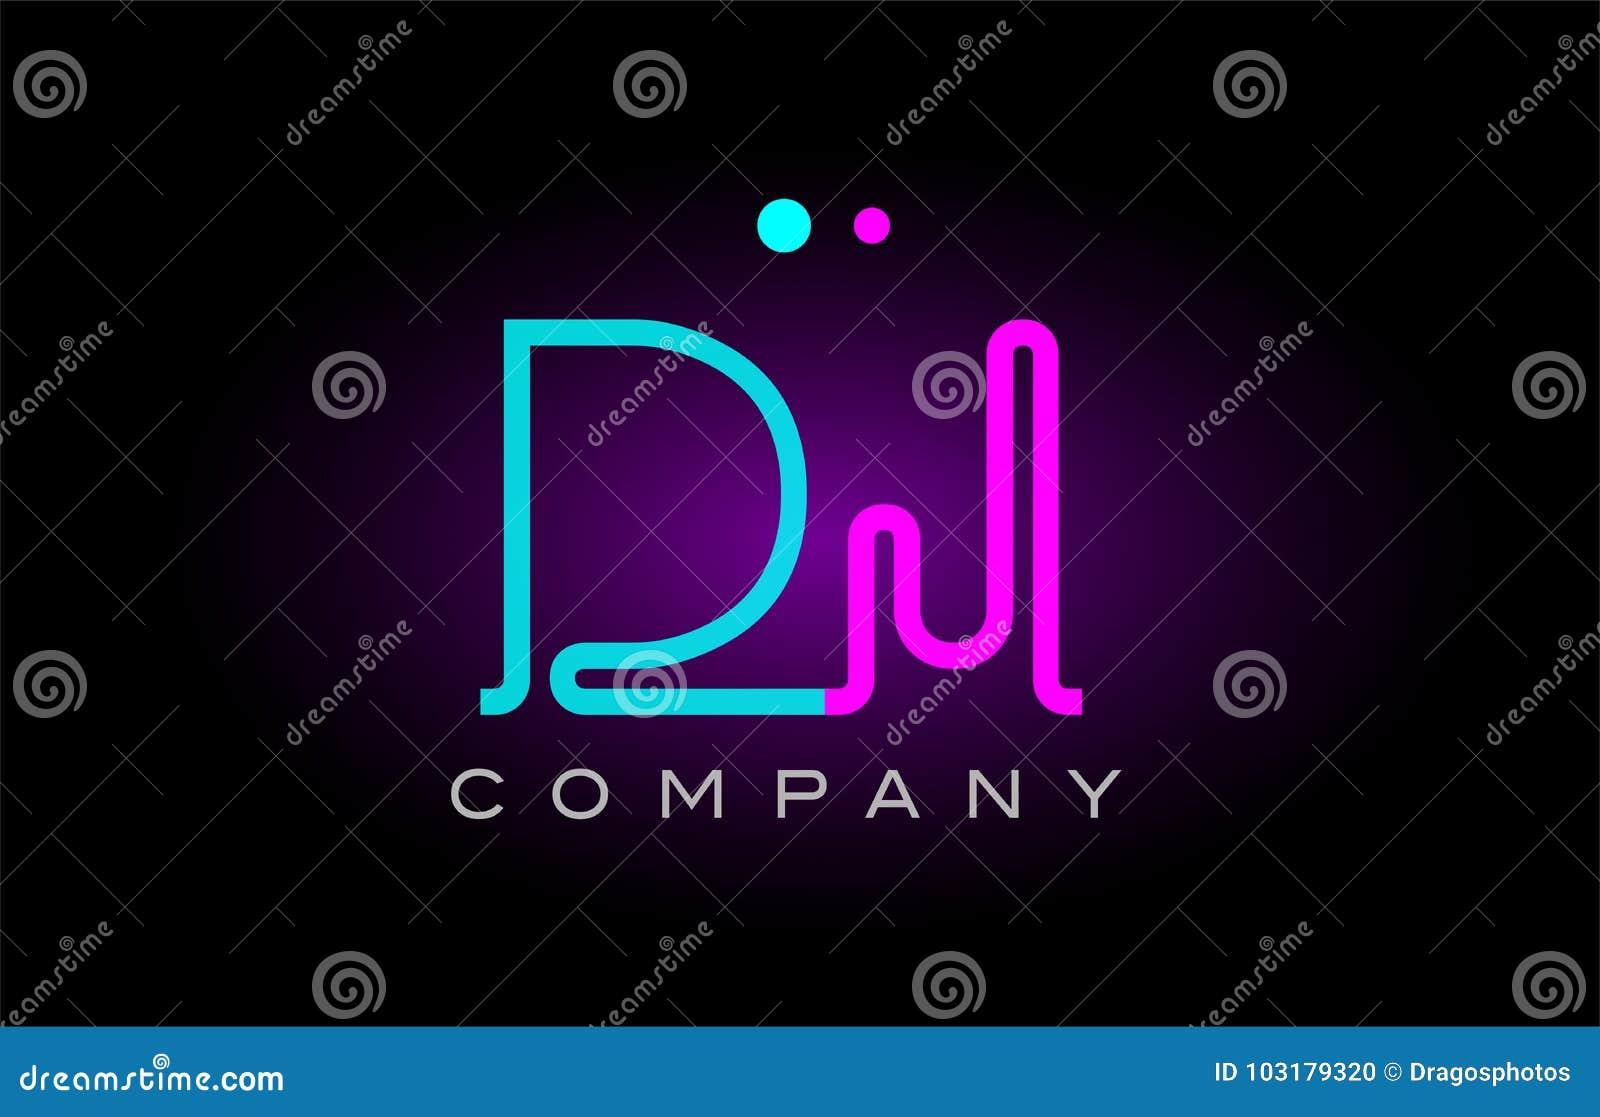 neon lights alphabet dj d j letter logo icon combination design